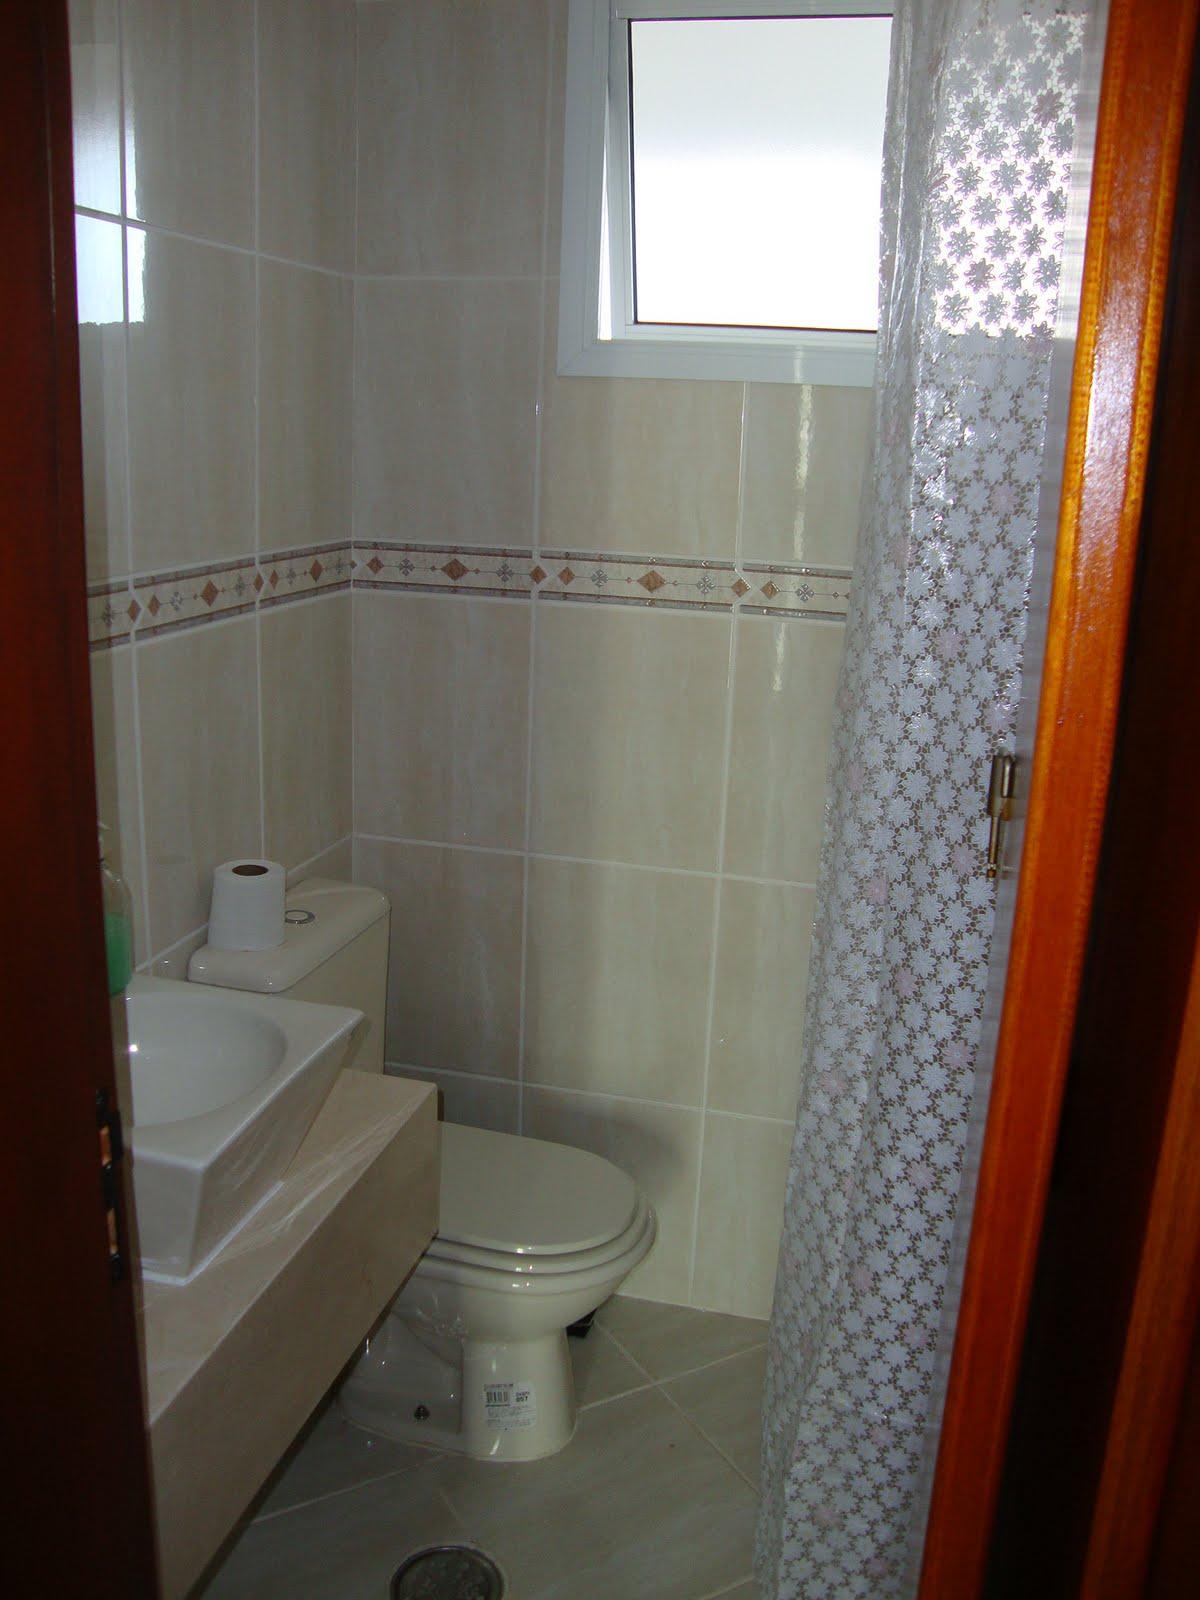 Ma vie un art: Coifinha Nova e Cortina no Banheiro!!! #BB6D10 1200x1600 Banheiro Box Cortina